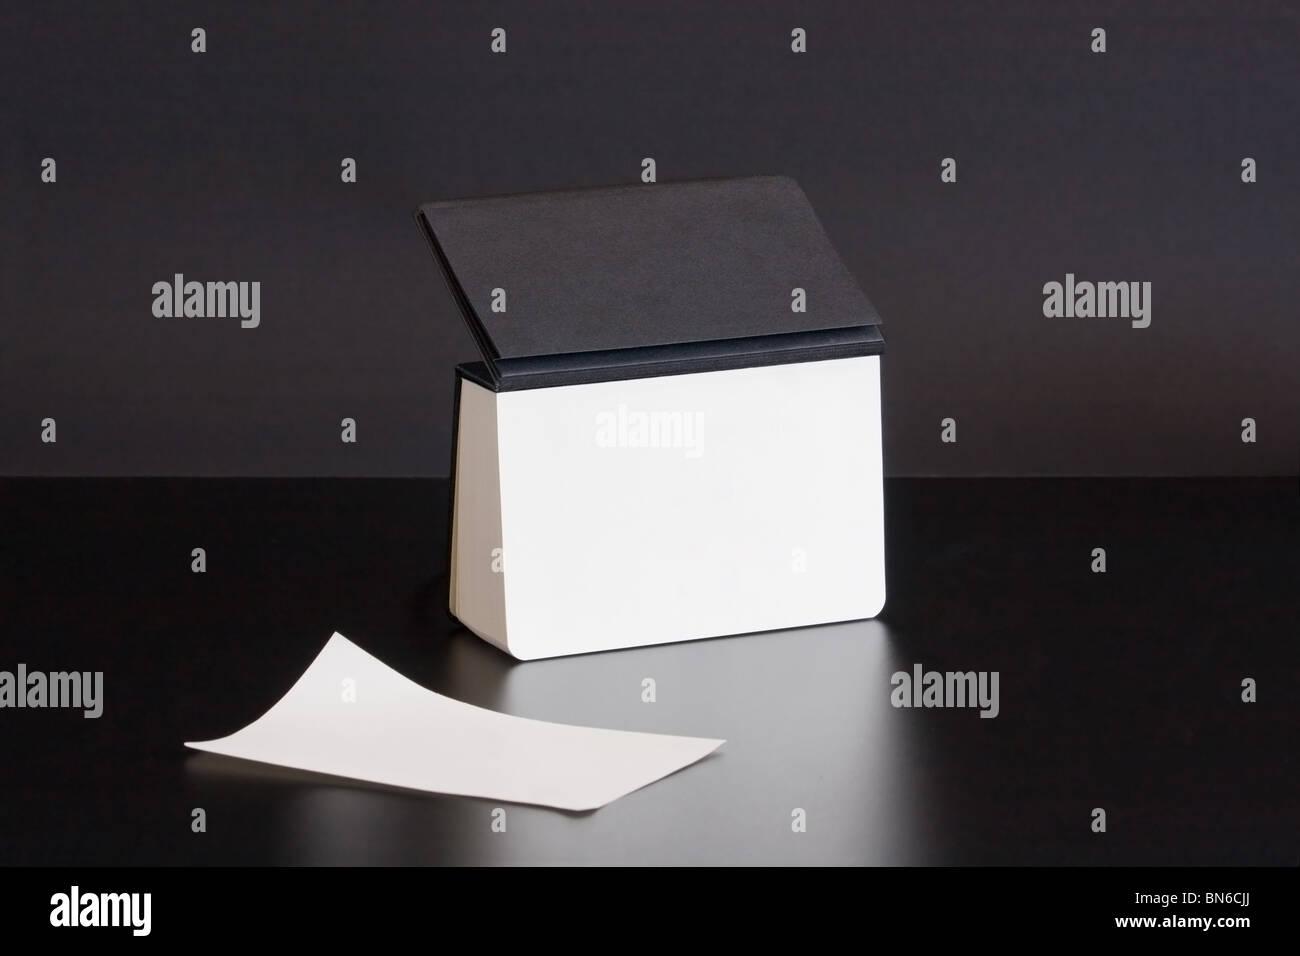 Black desktop calendar with blank sheet - Stock Image